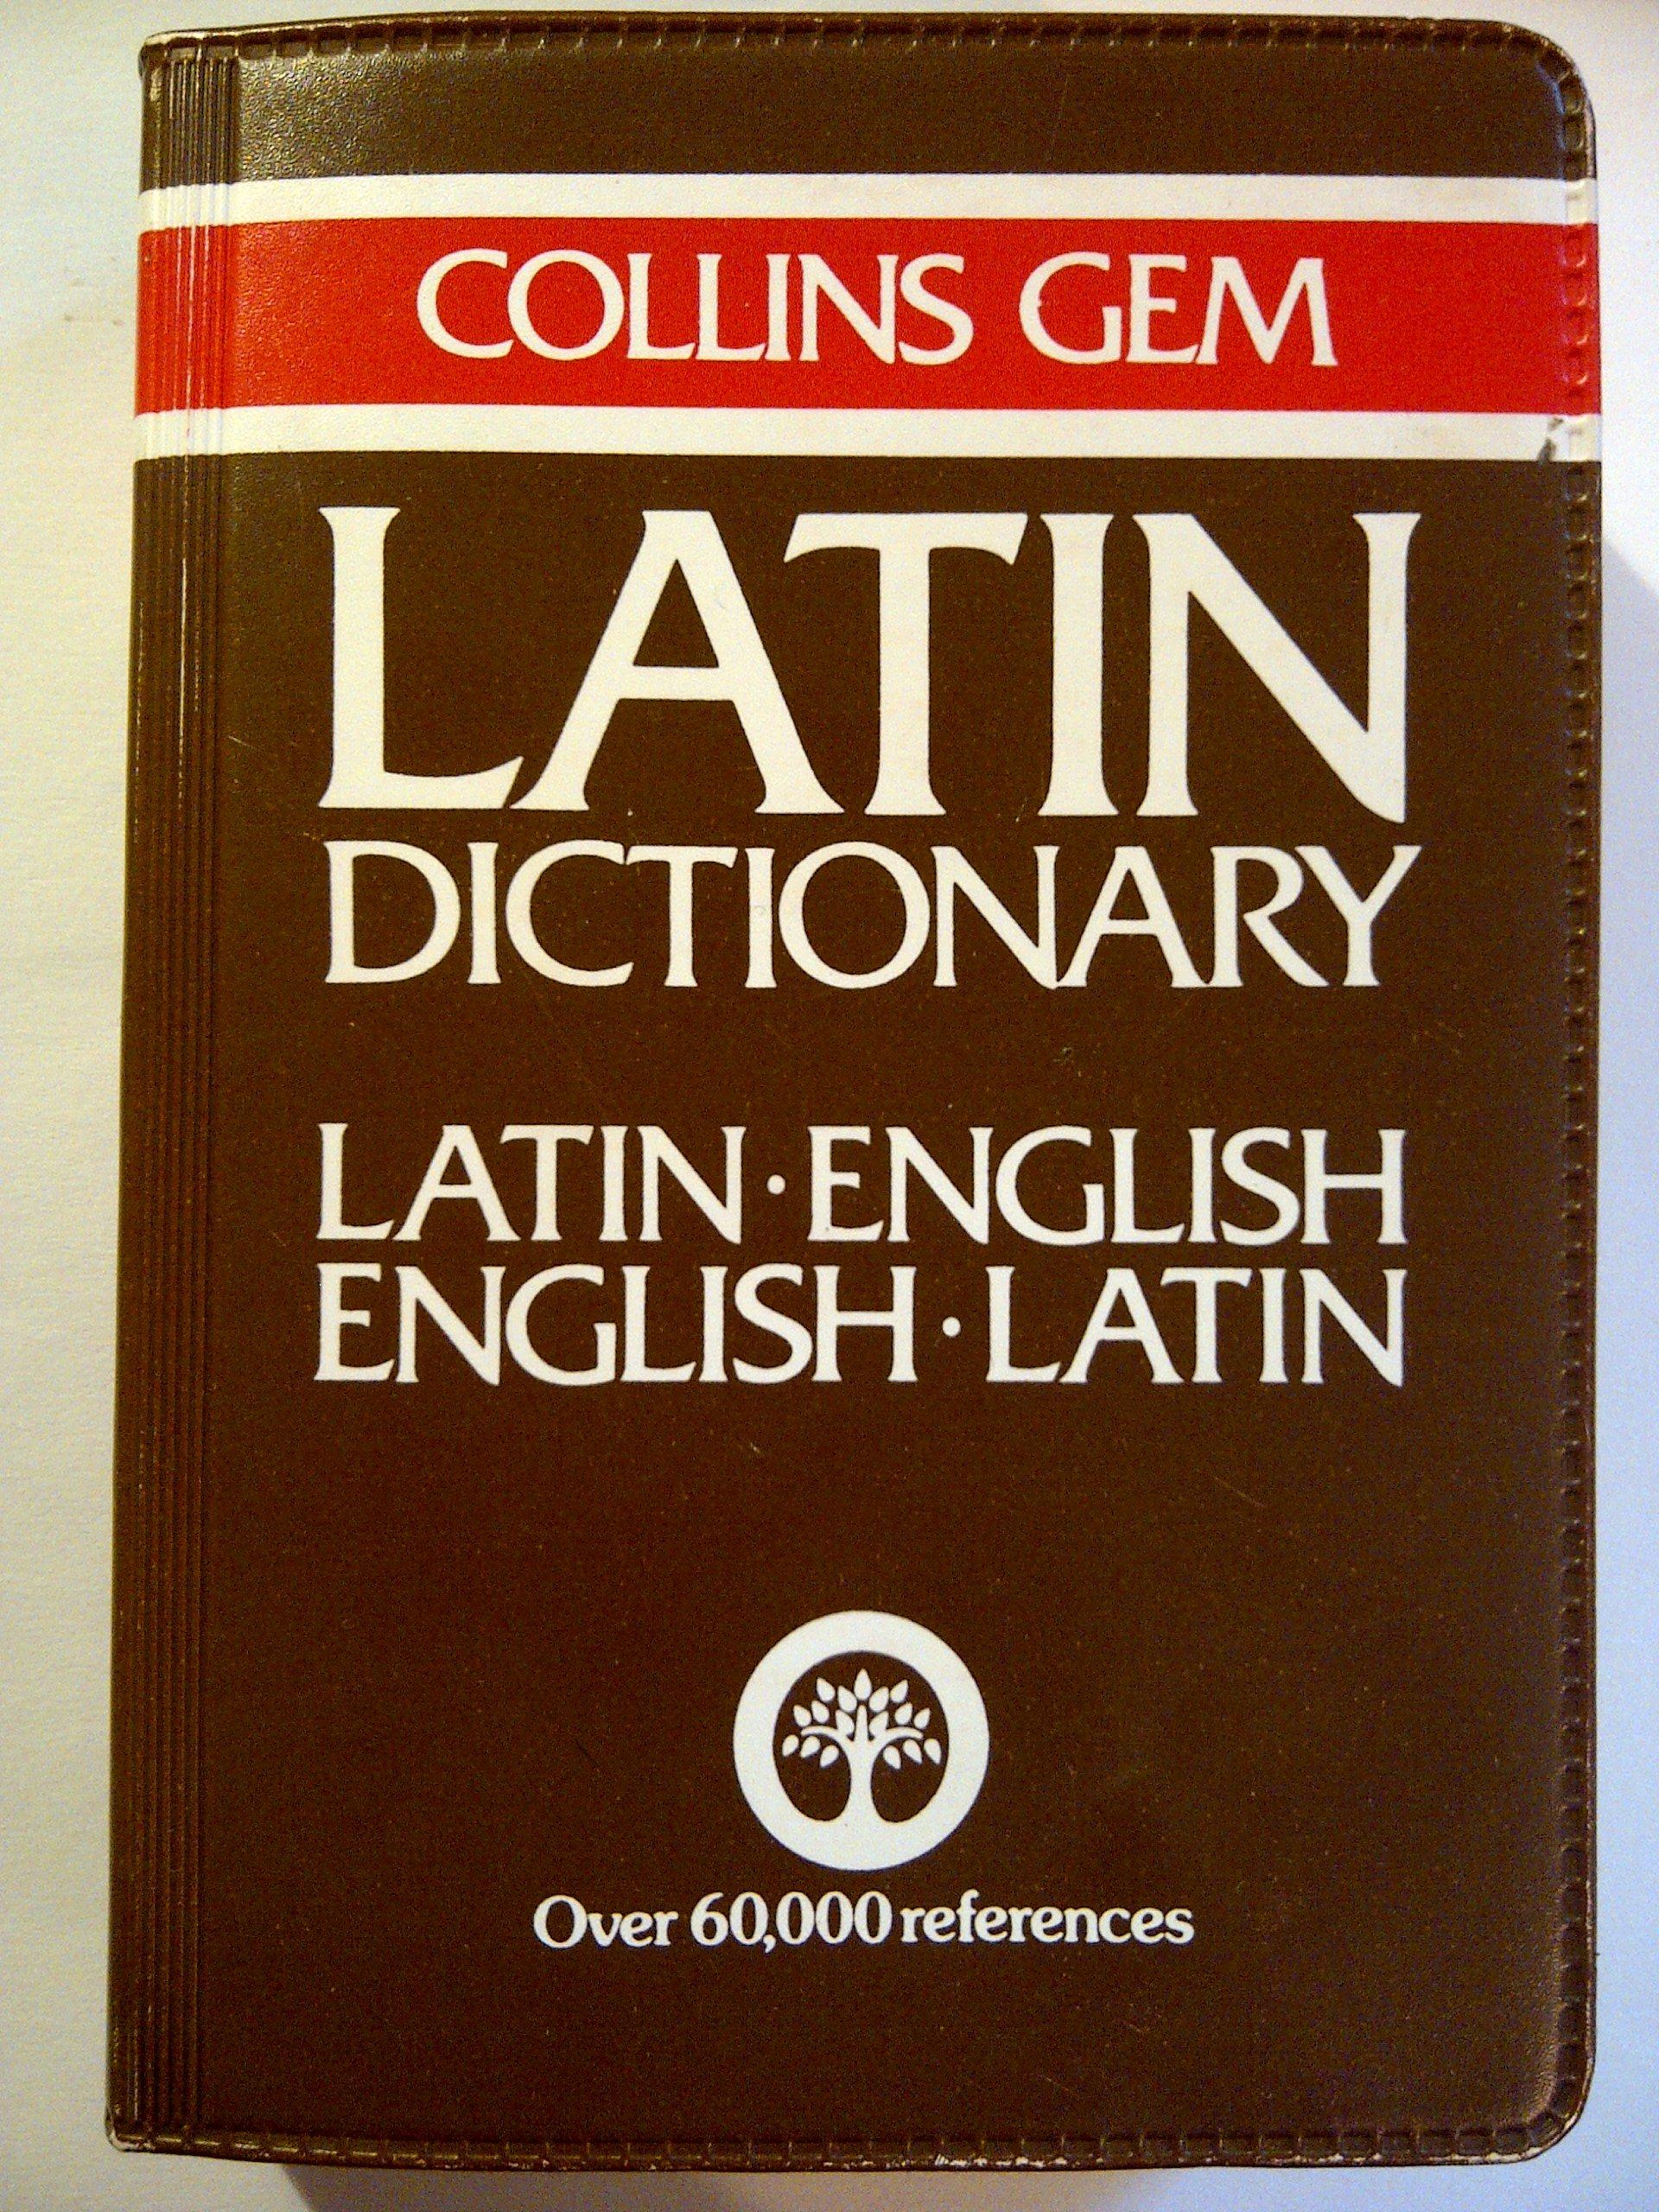 Collins Gem Dictionary: Latin-English, English Latin: D. A. Kidd:  9780004586441: Amazon.com: Books